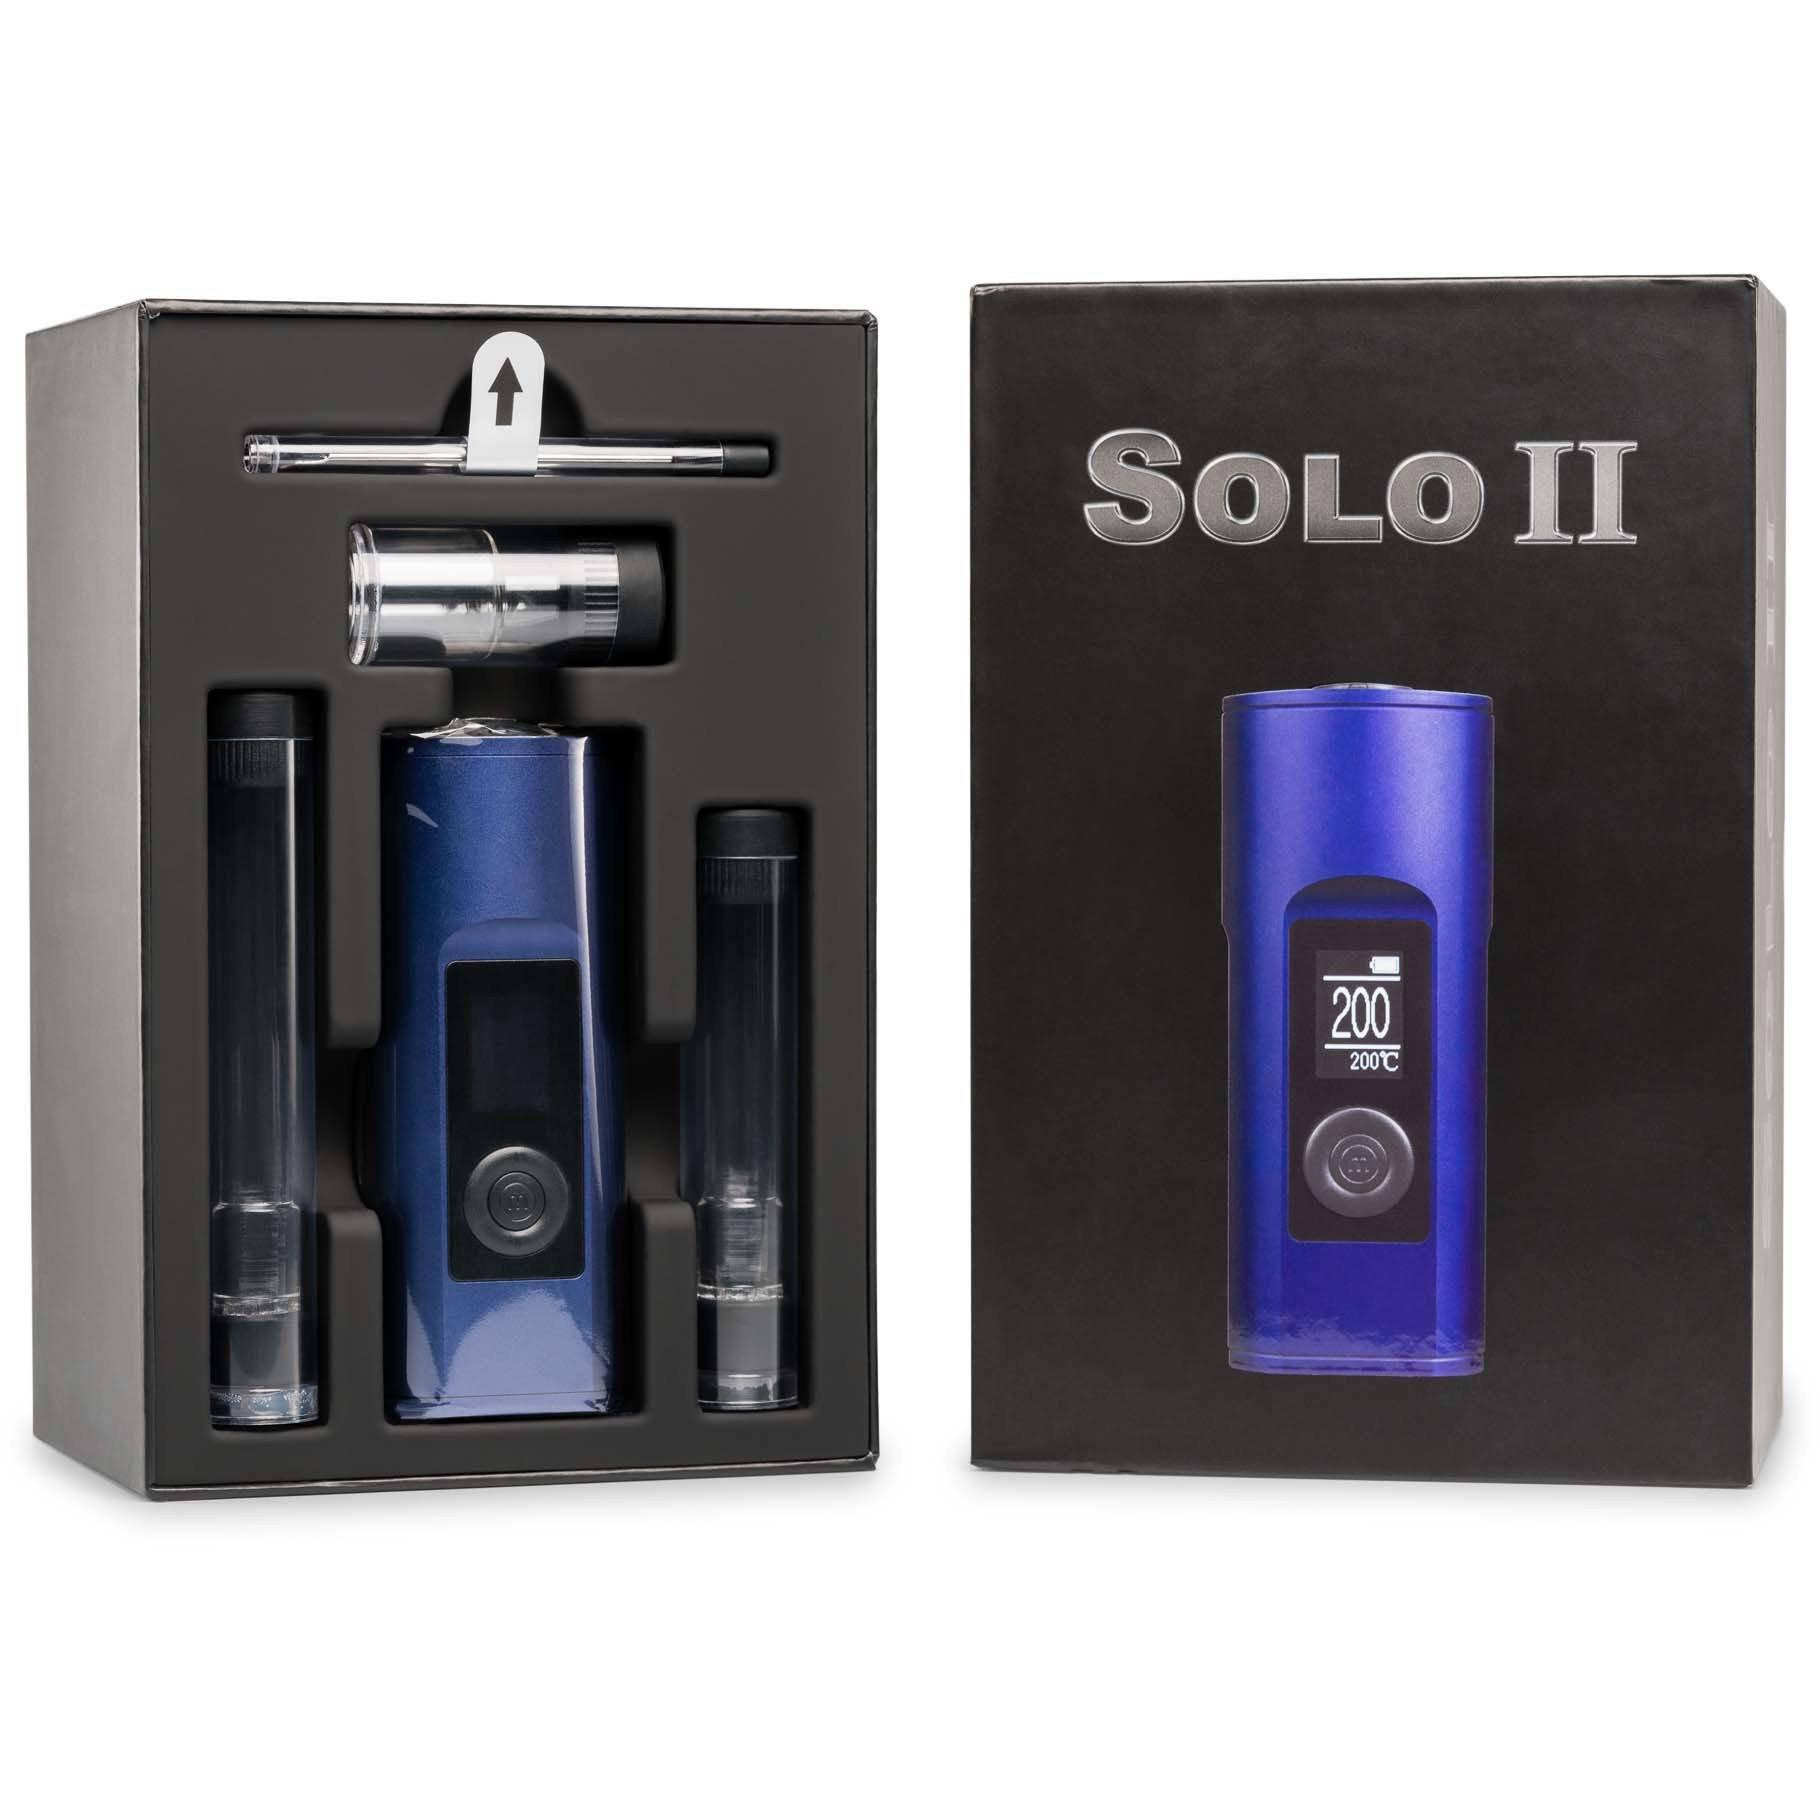 vaporizer-arizer-solo-ii-vaporizer-15_2048x